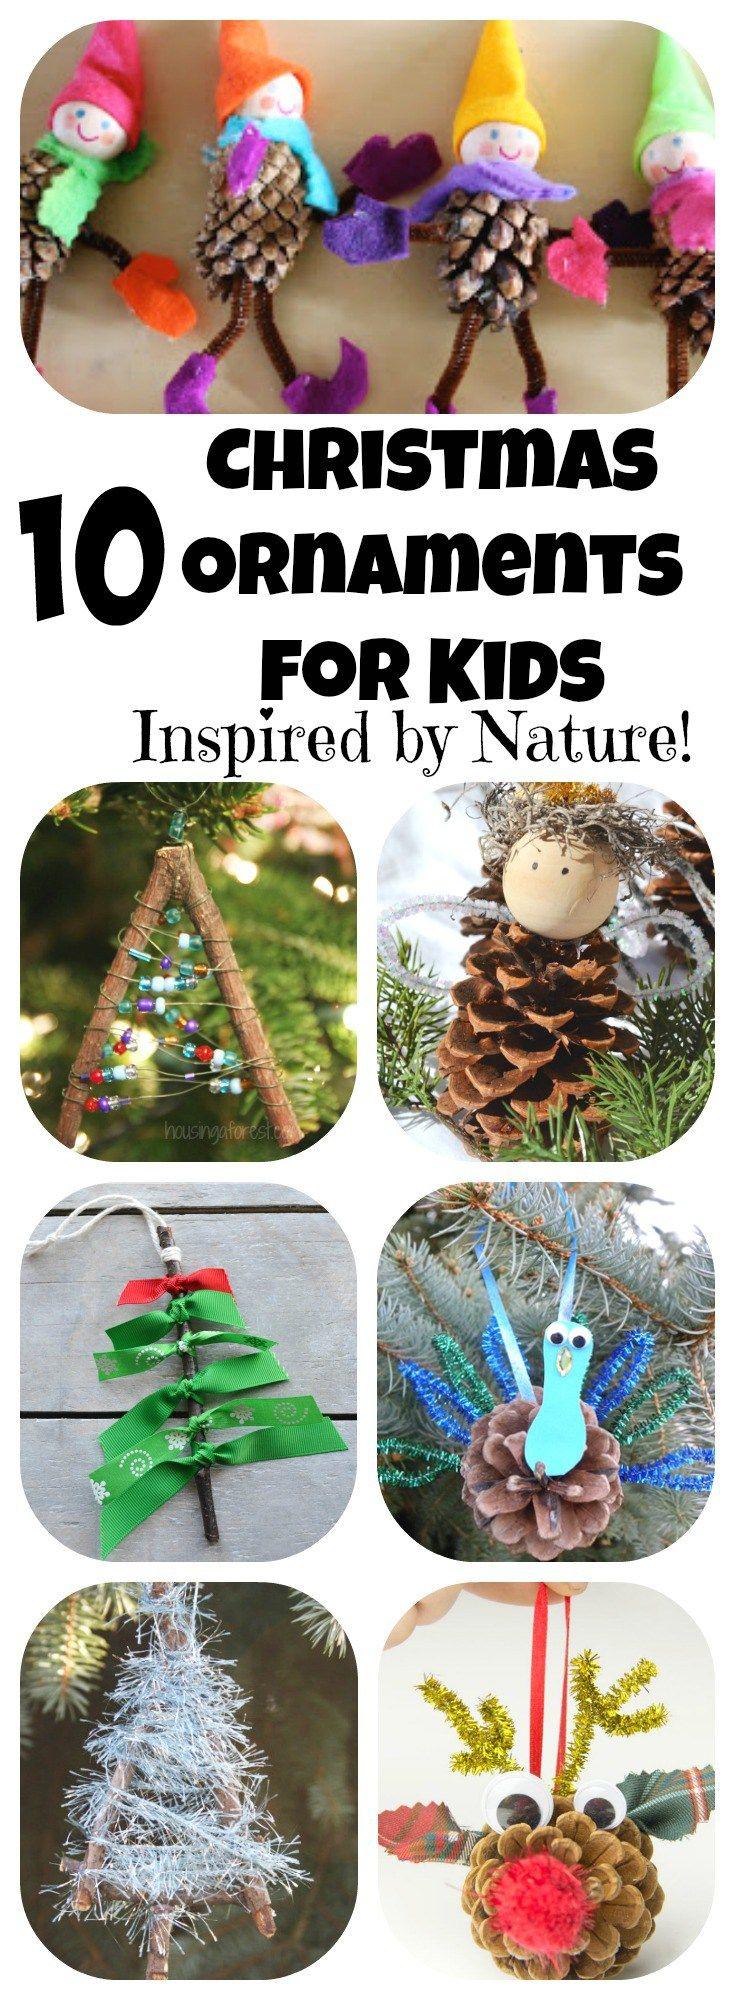 42 best Holiday: Yule Xmas images on Pinterest | Christmas deco ...